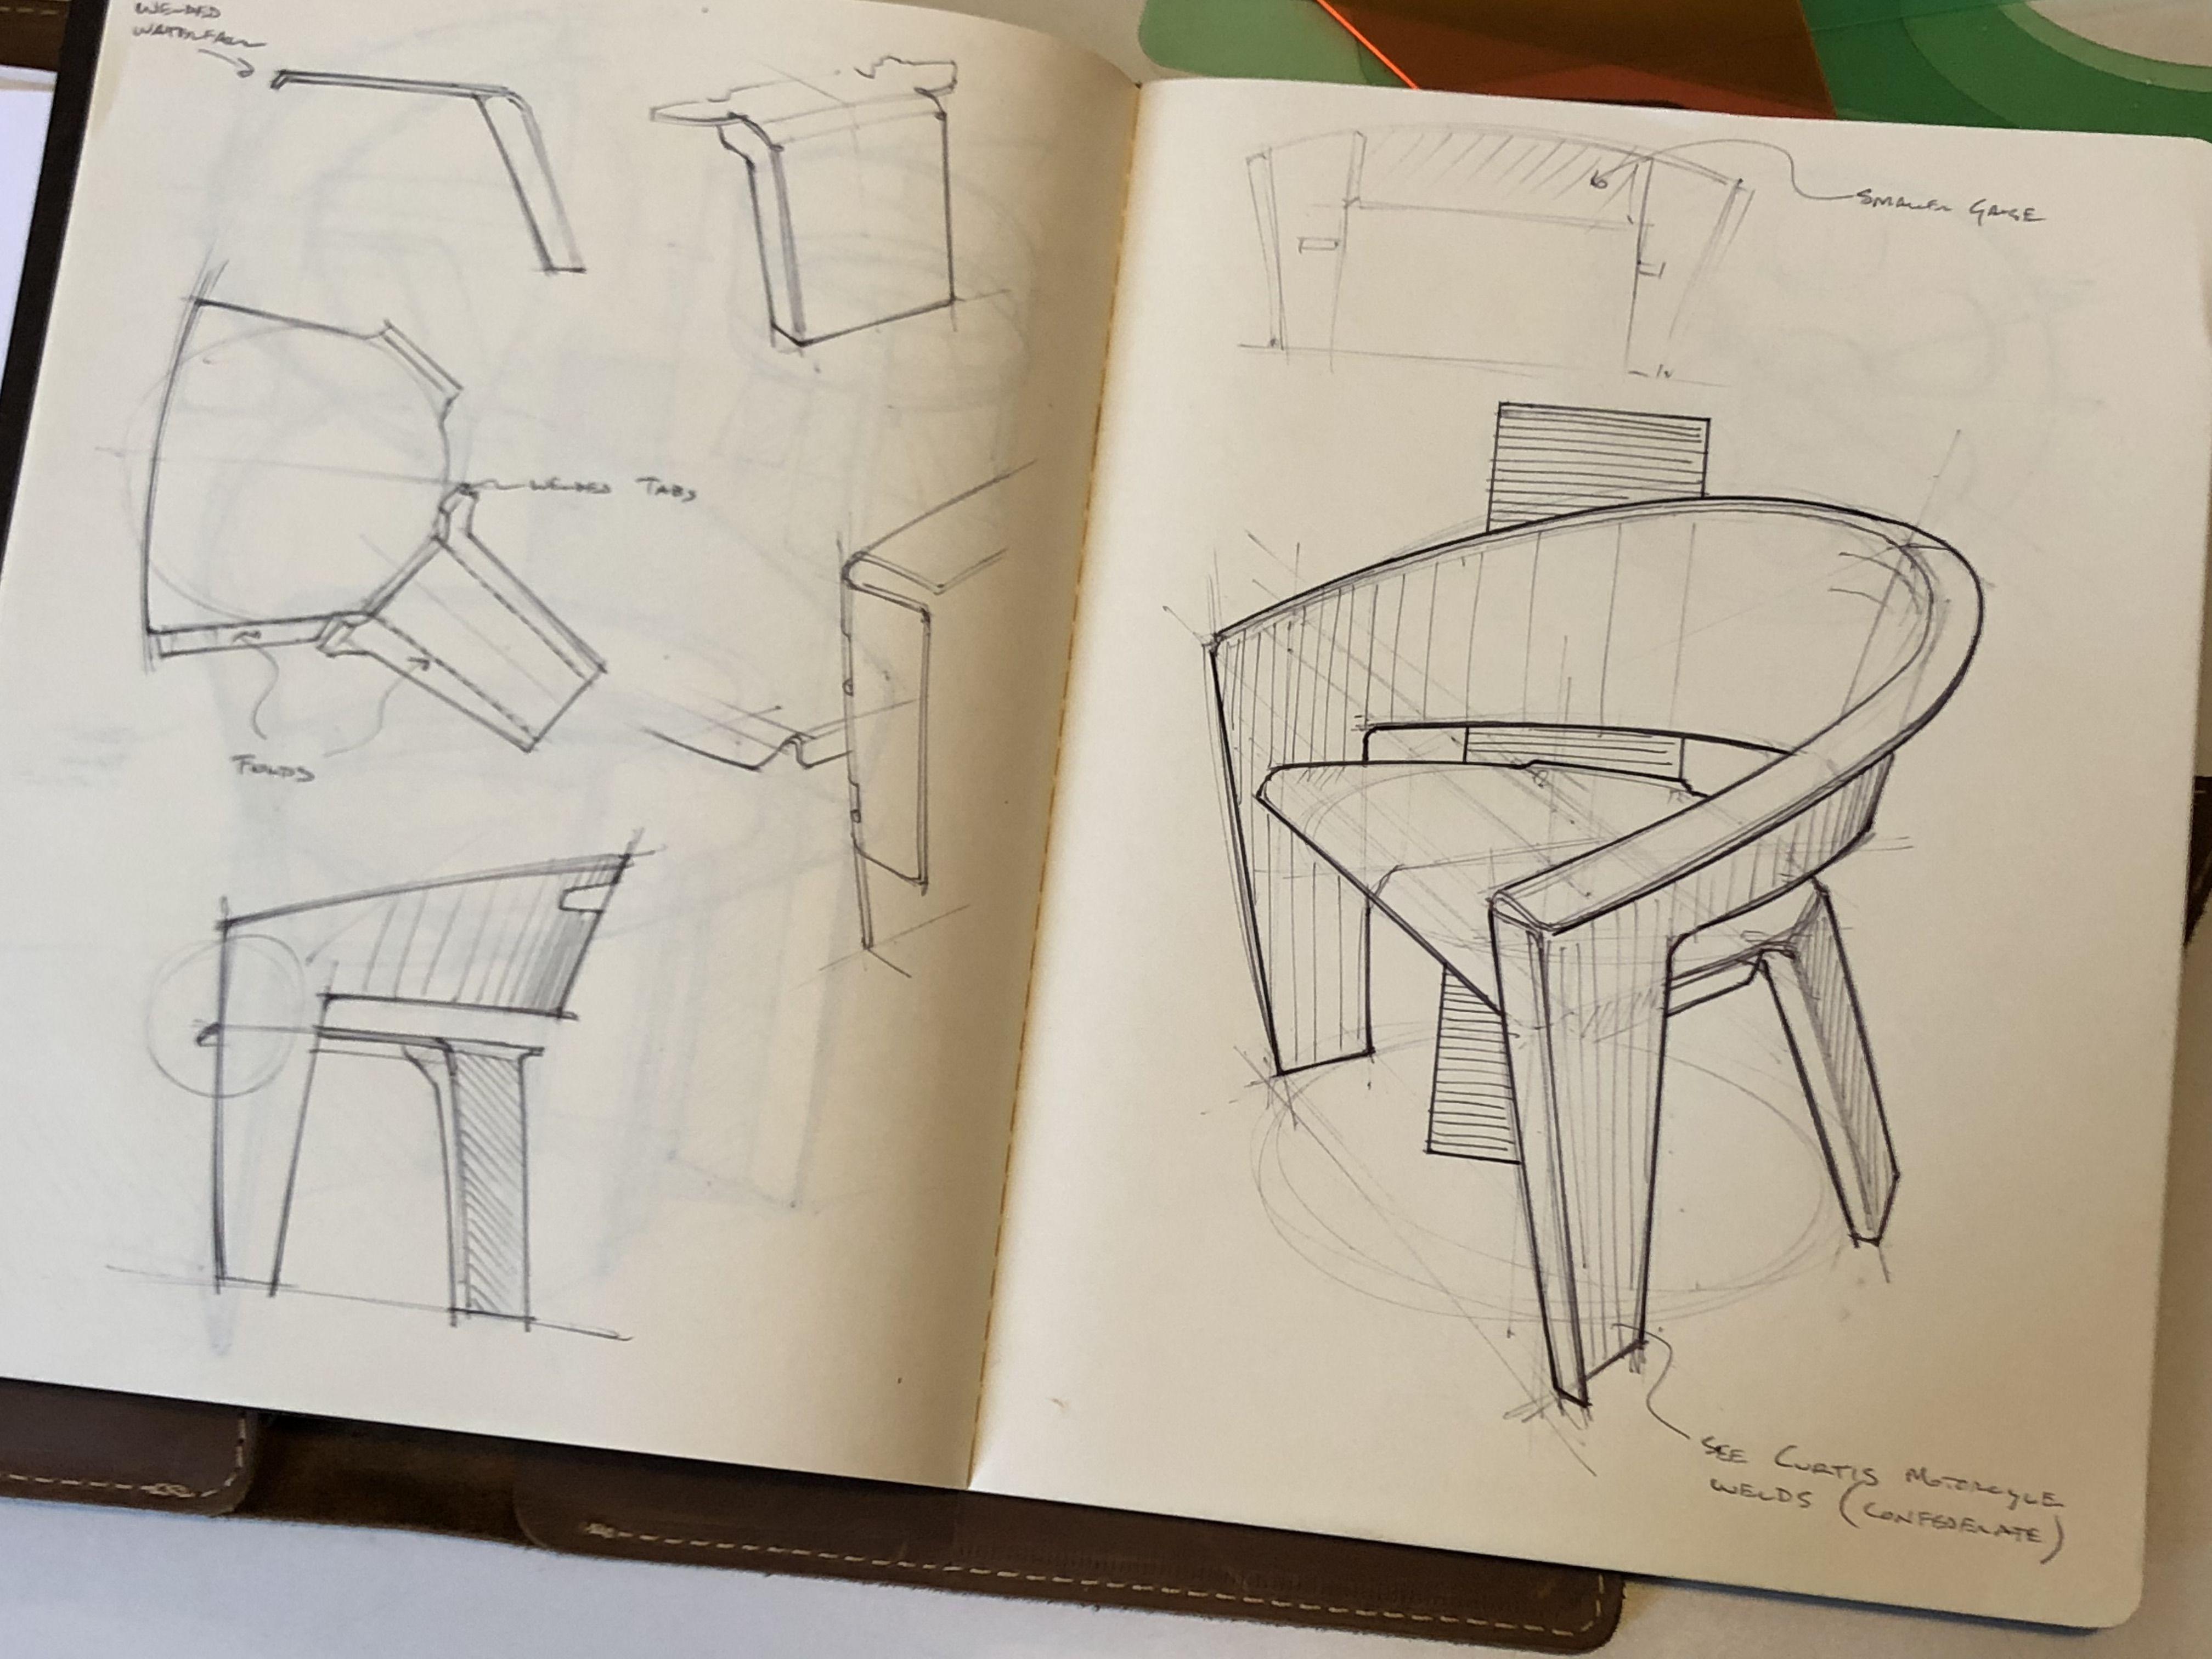 #industrialdesign #designsketching #exploration #sketch #design